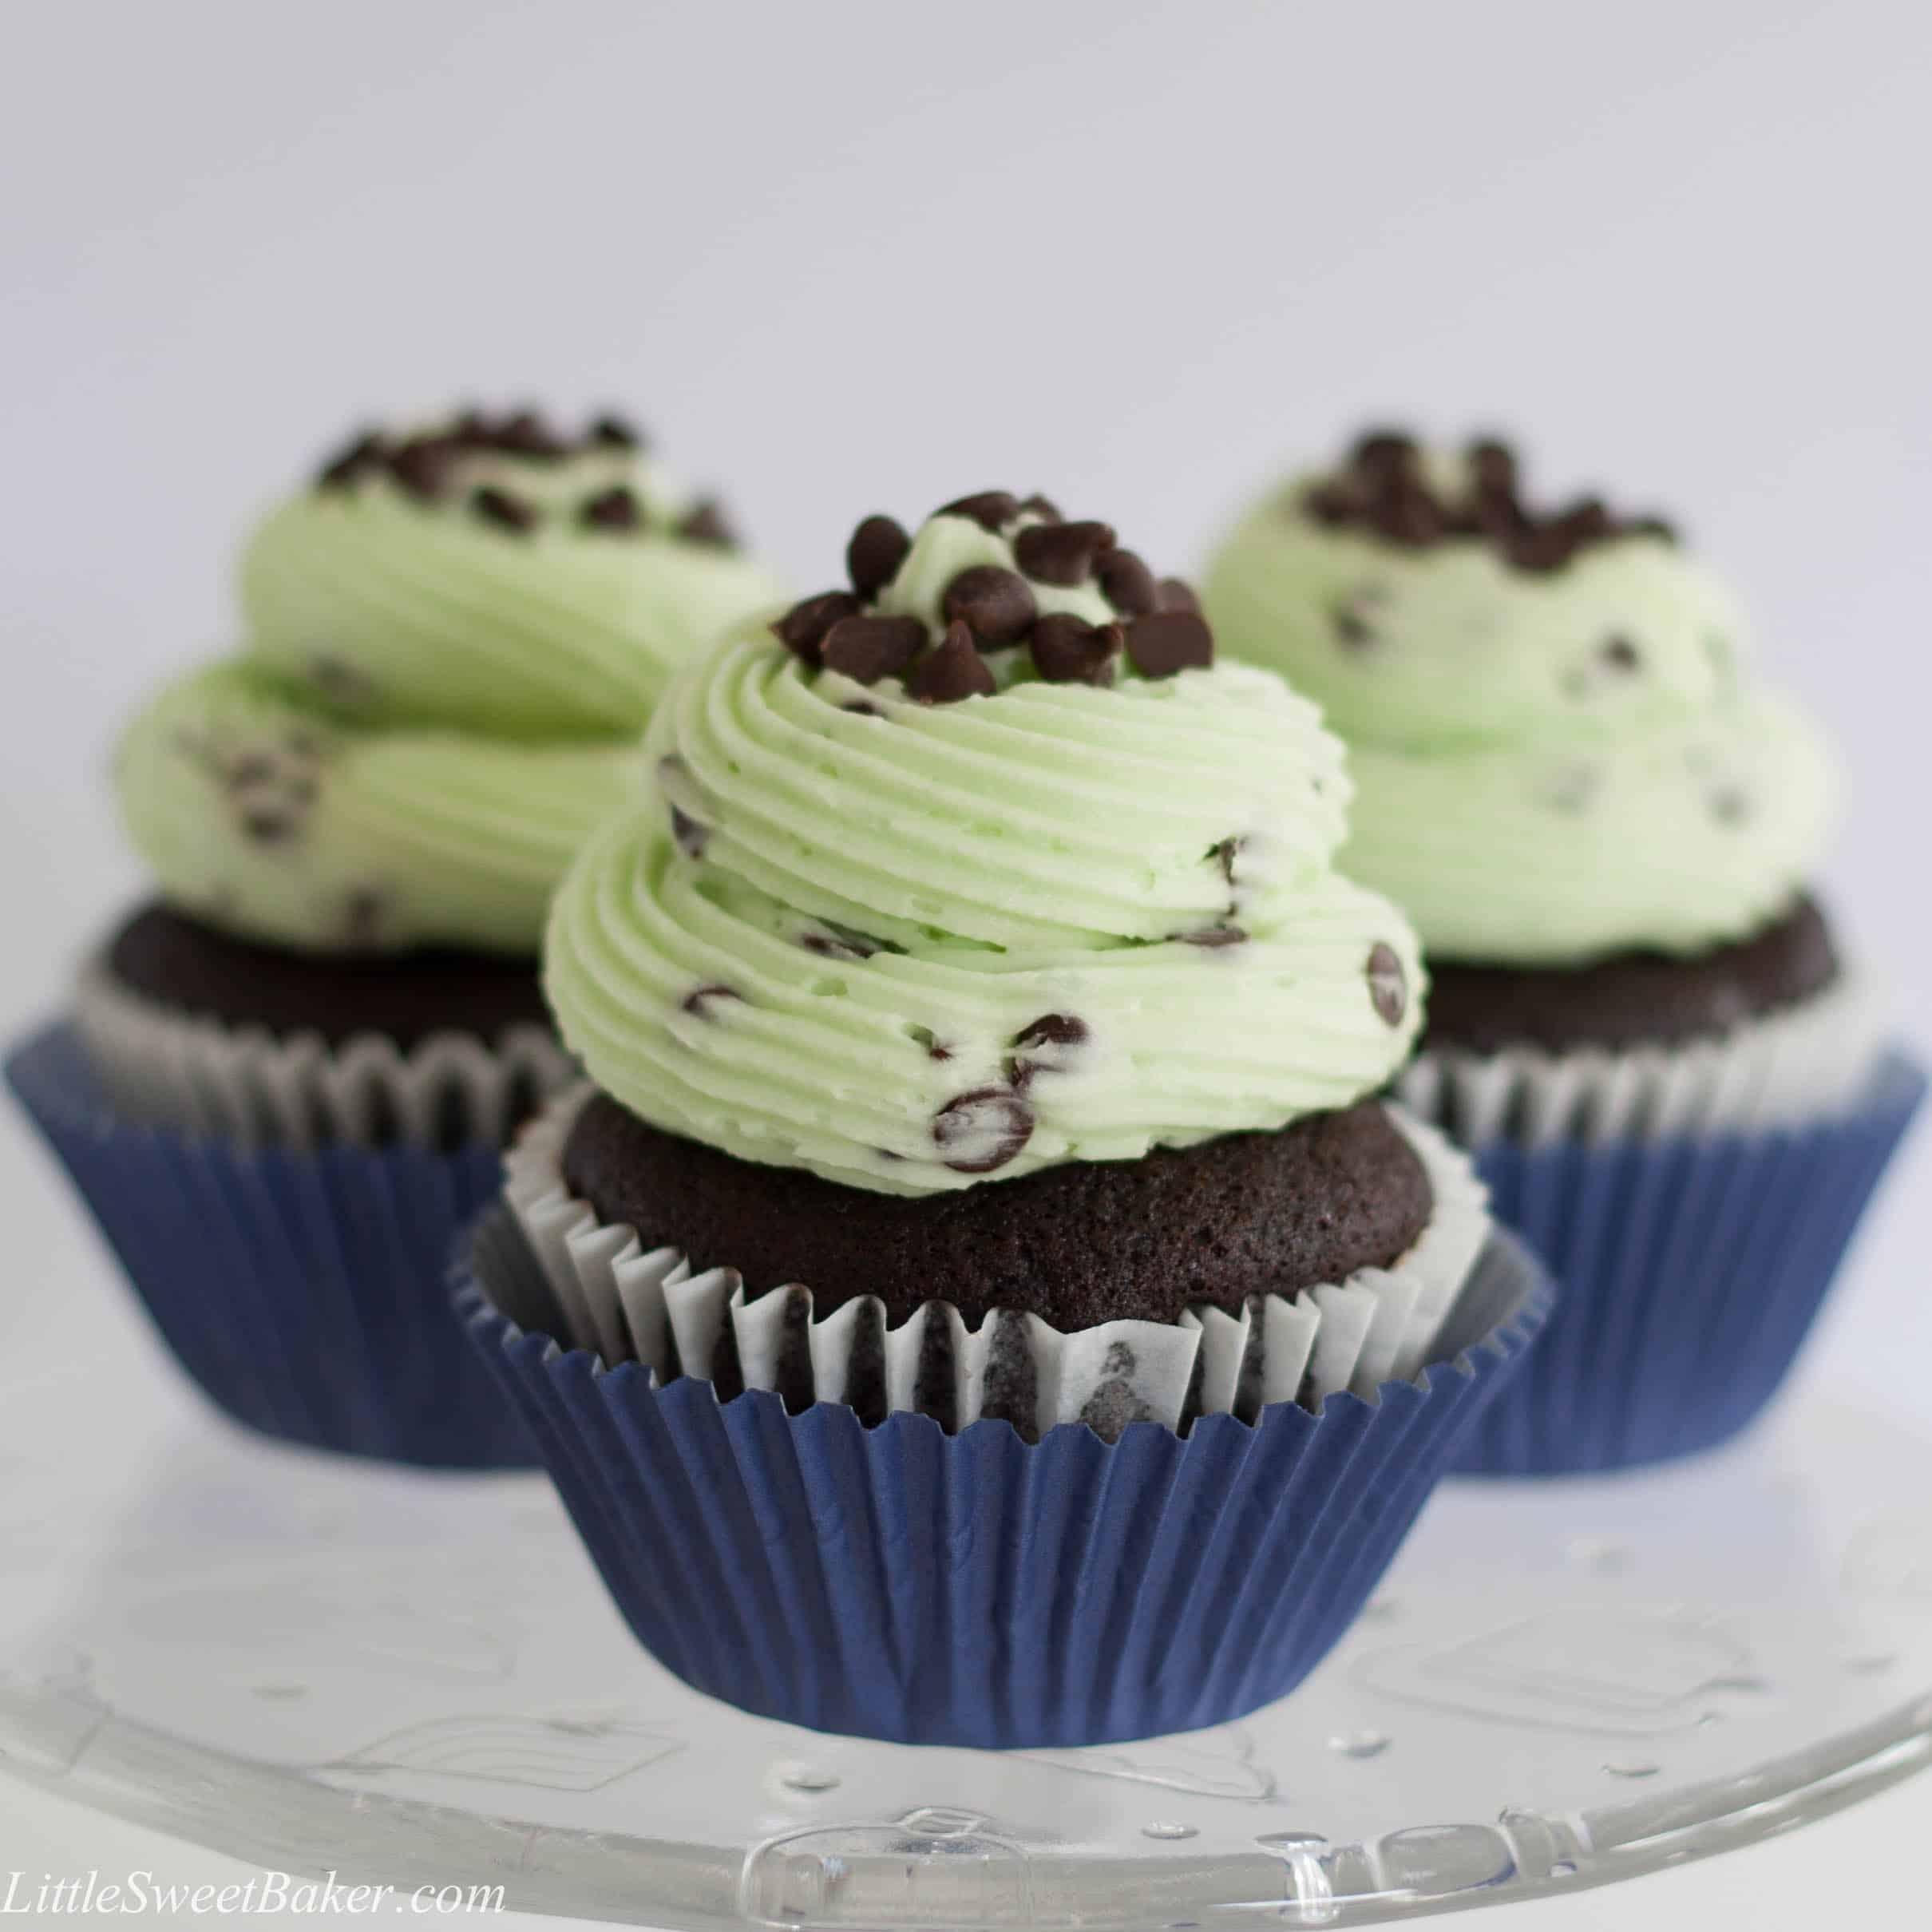 Chocolate Chocolate Chip Cupcakes With Cake Mix